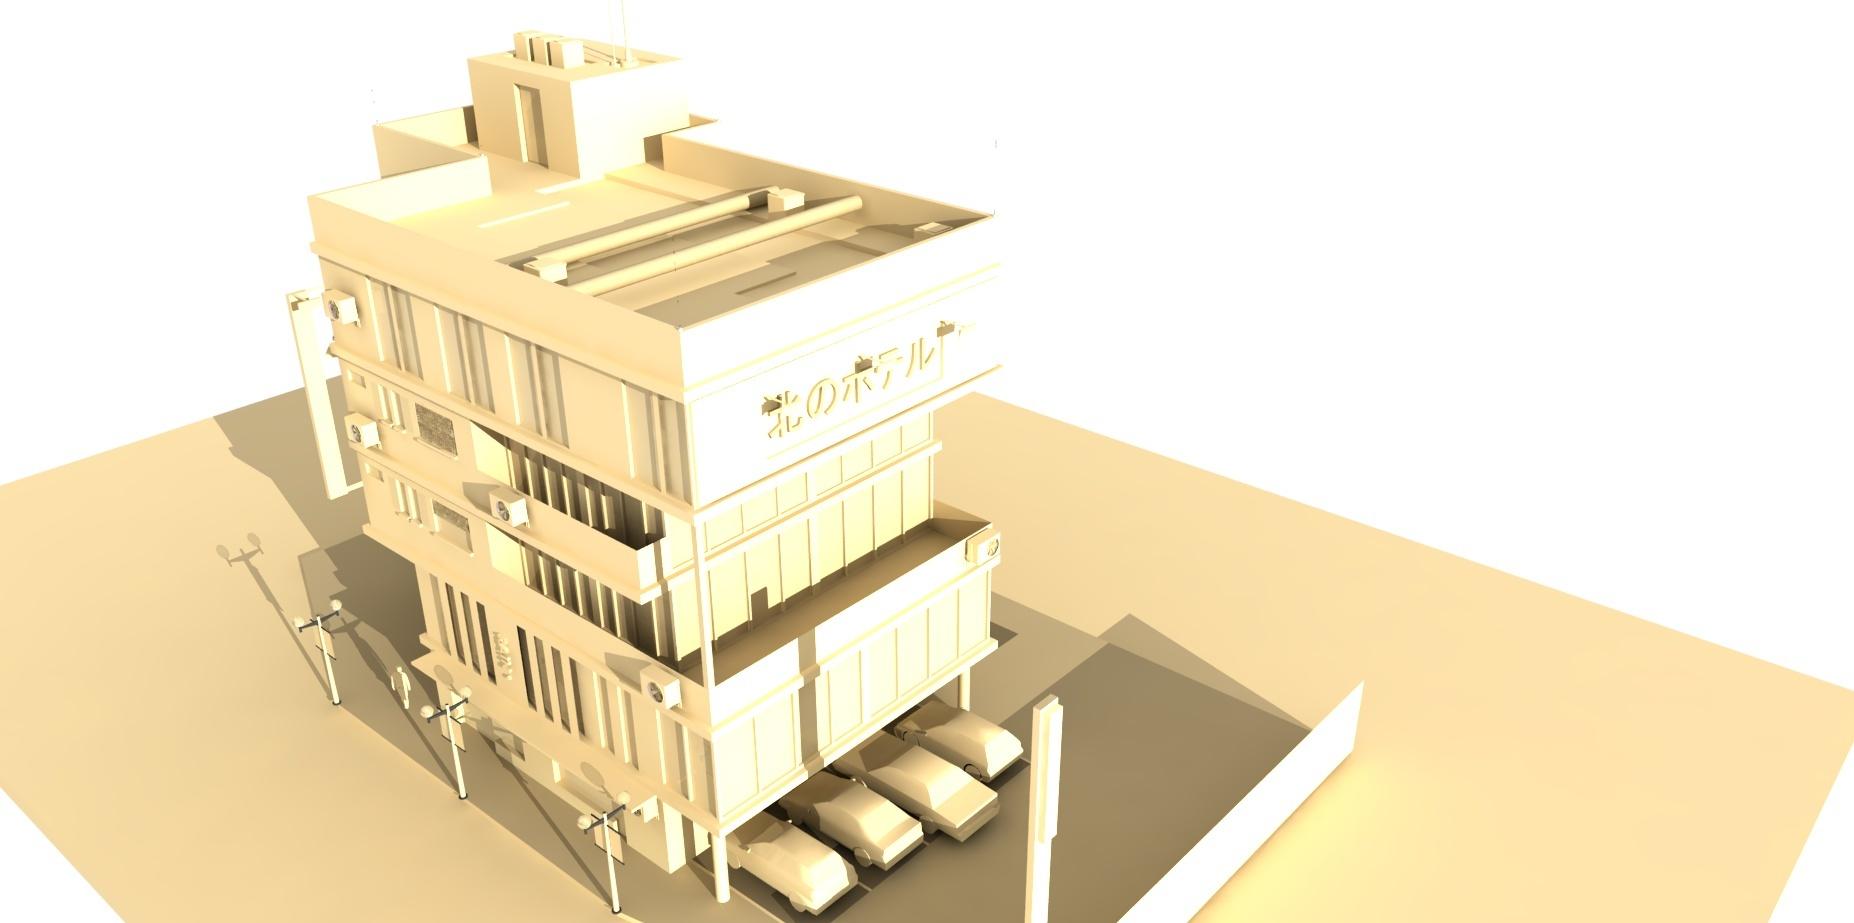 SketchUp'eur architecte -AnthO'- - Page 4 Hot410